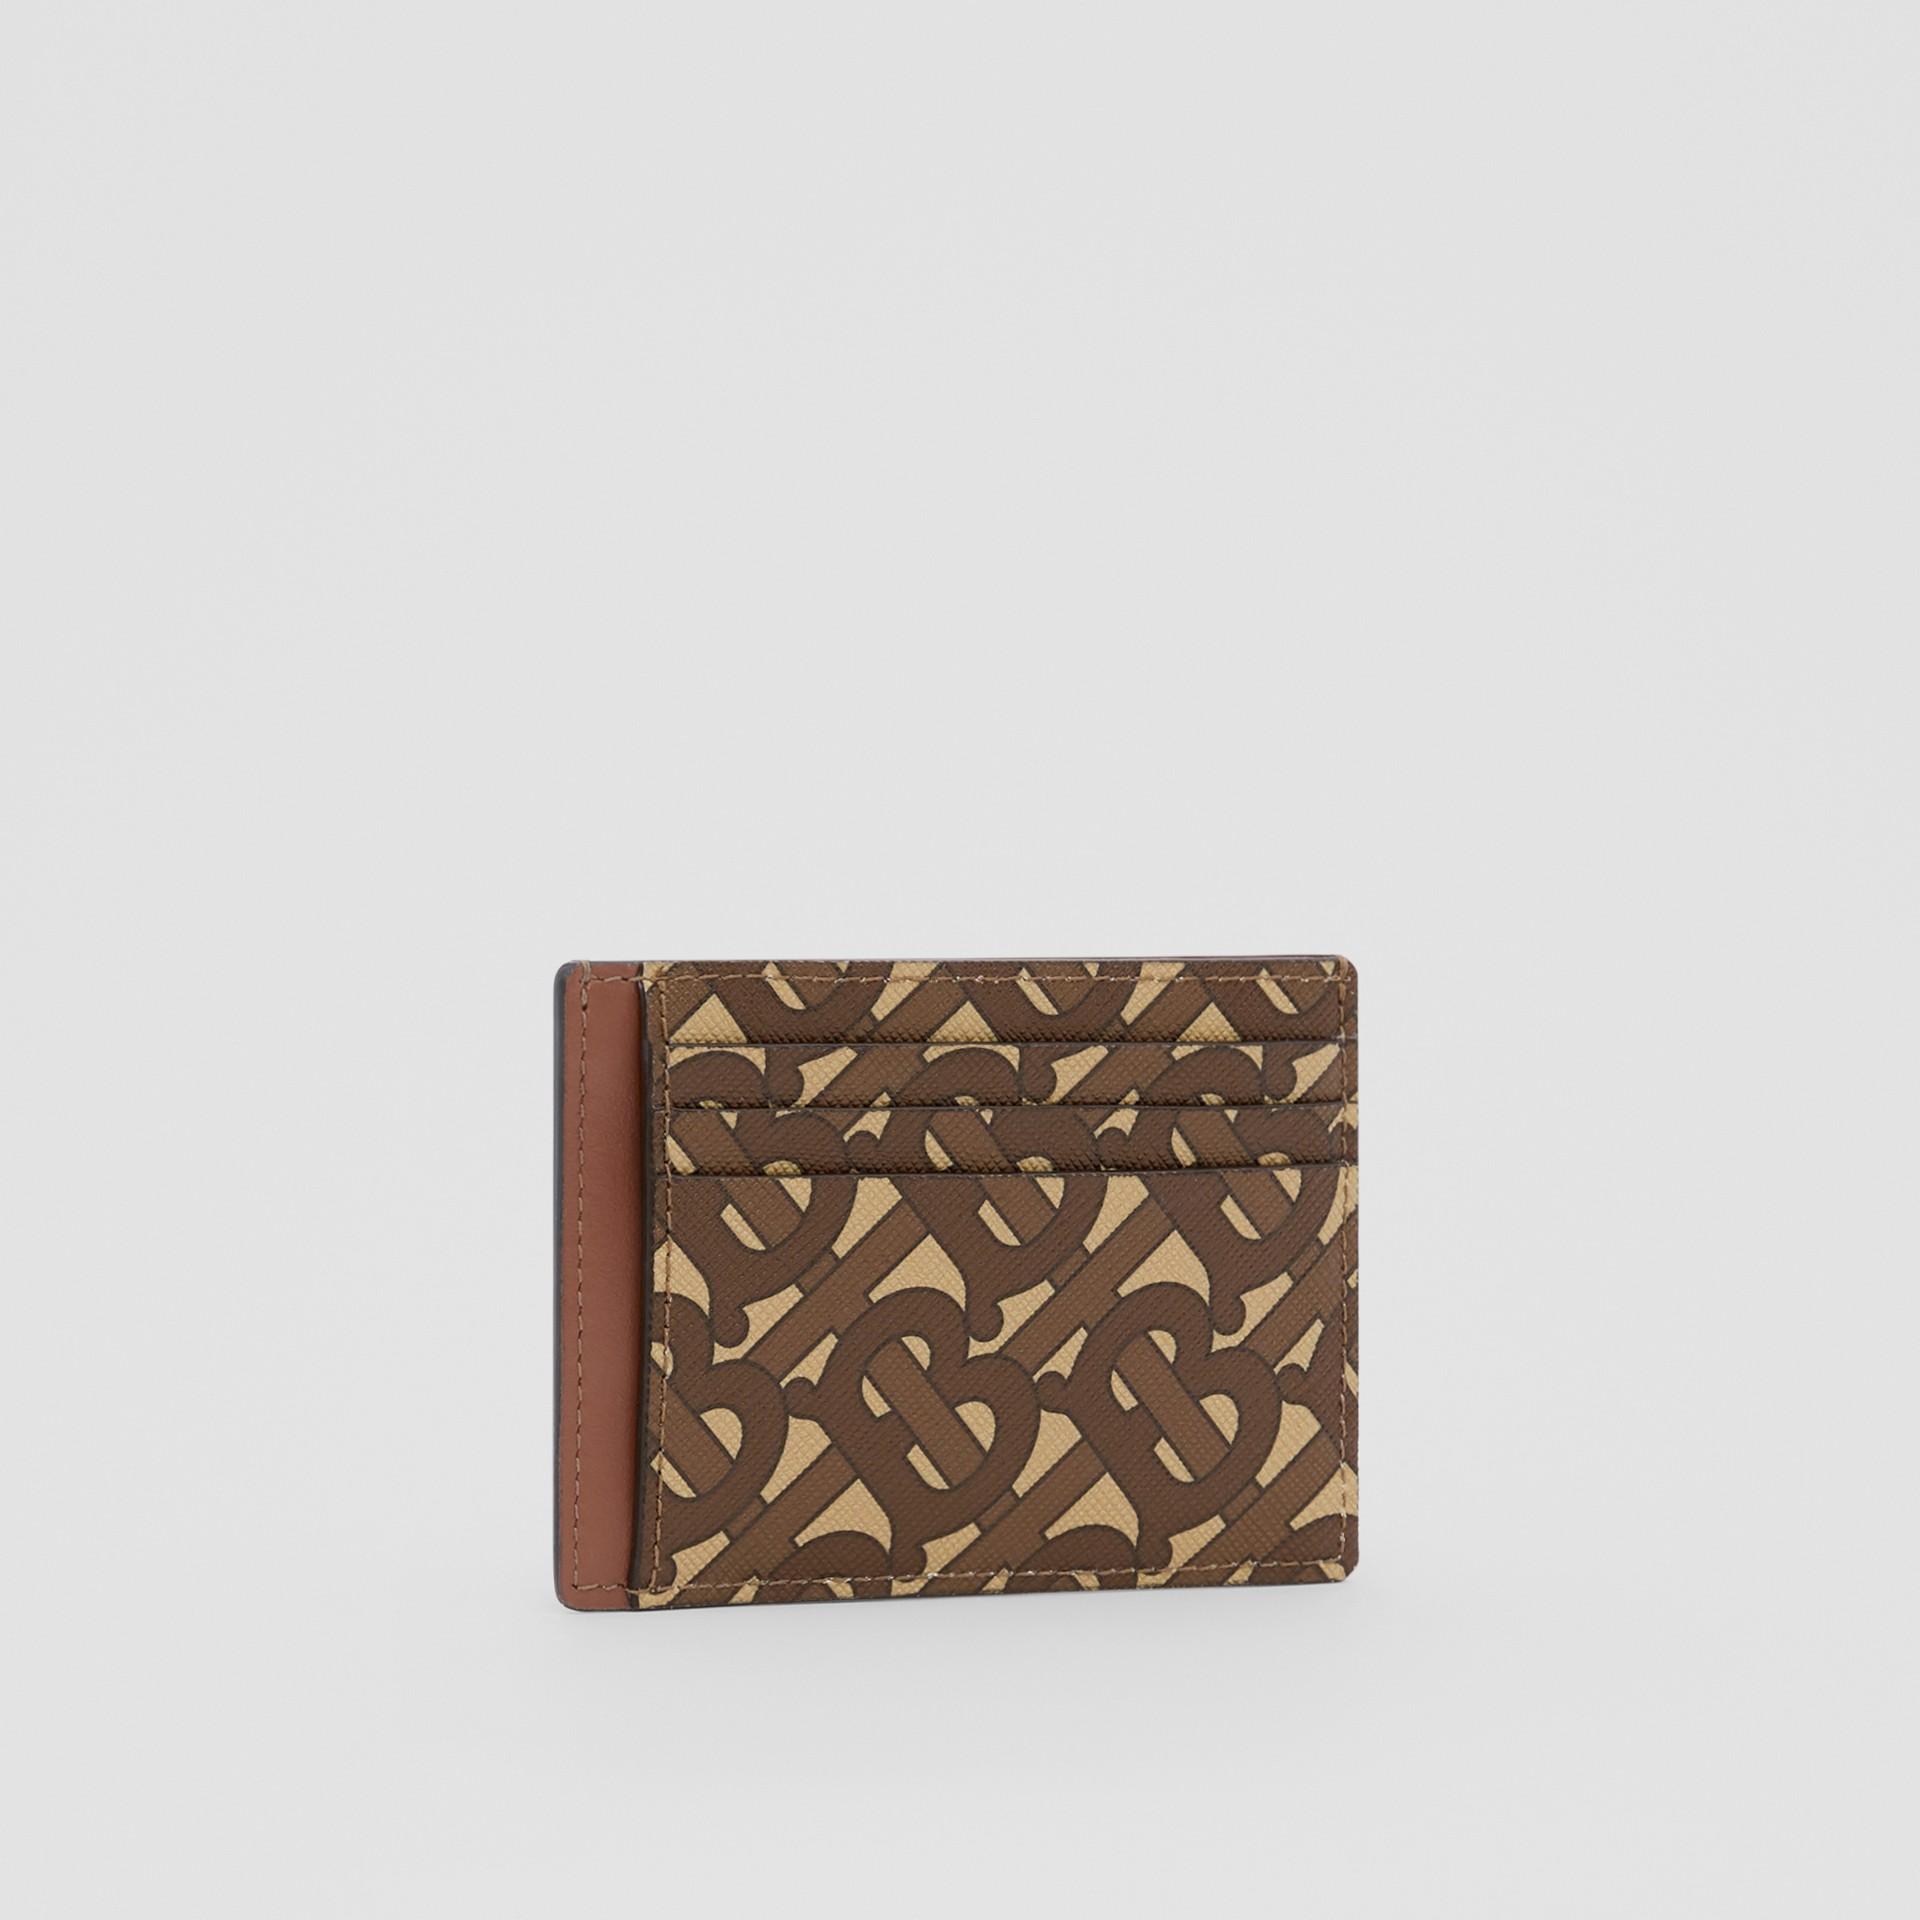 Monogram Print E-canvas Money Clip Card Case in Bridle Brown - Men | Burberry - gallery image 3